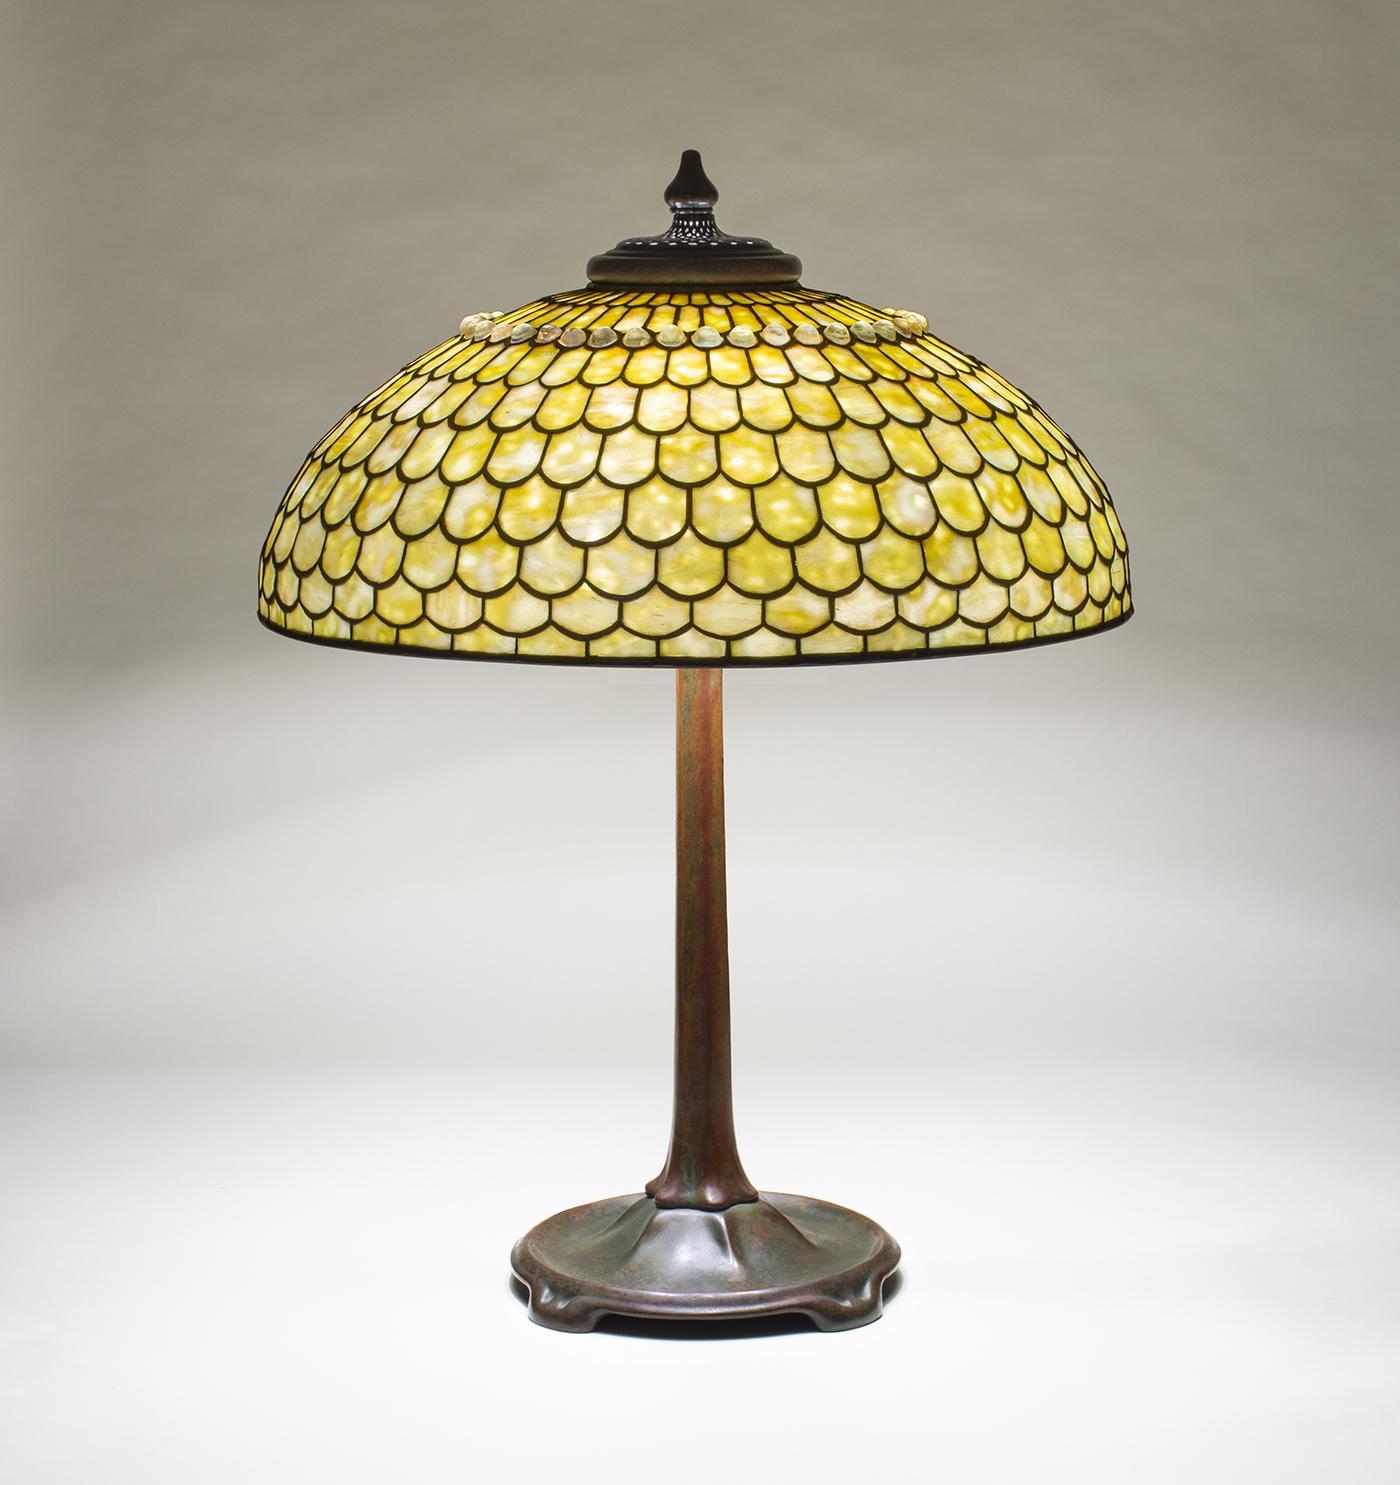 Tiffany Studios  Jeweled Fish Scale Table Lamp 1